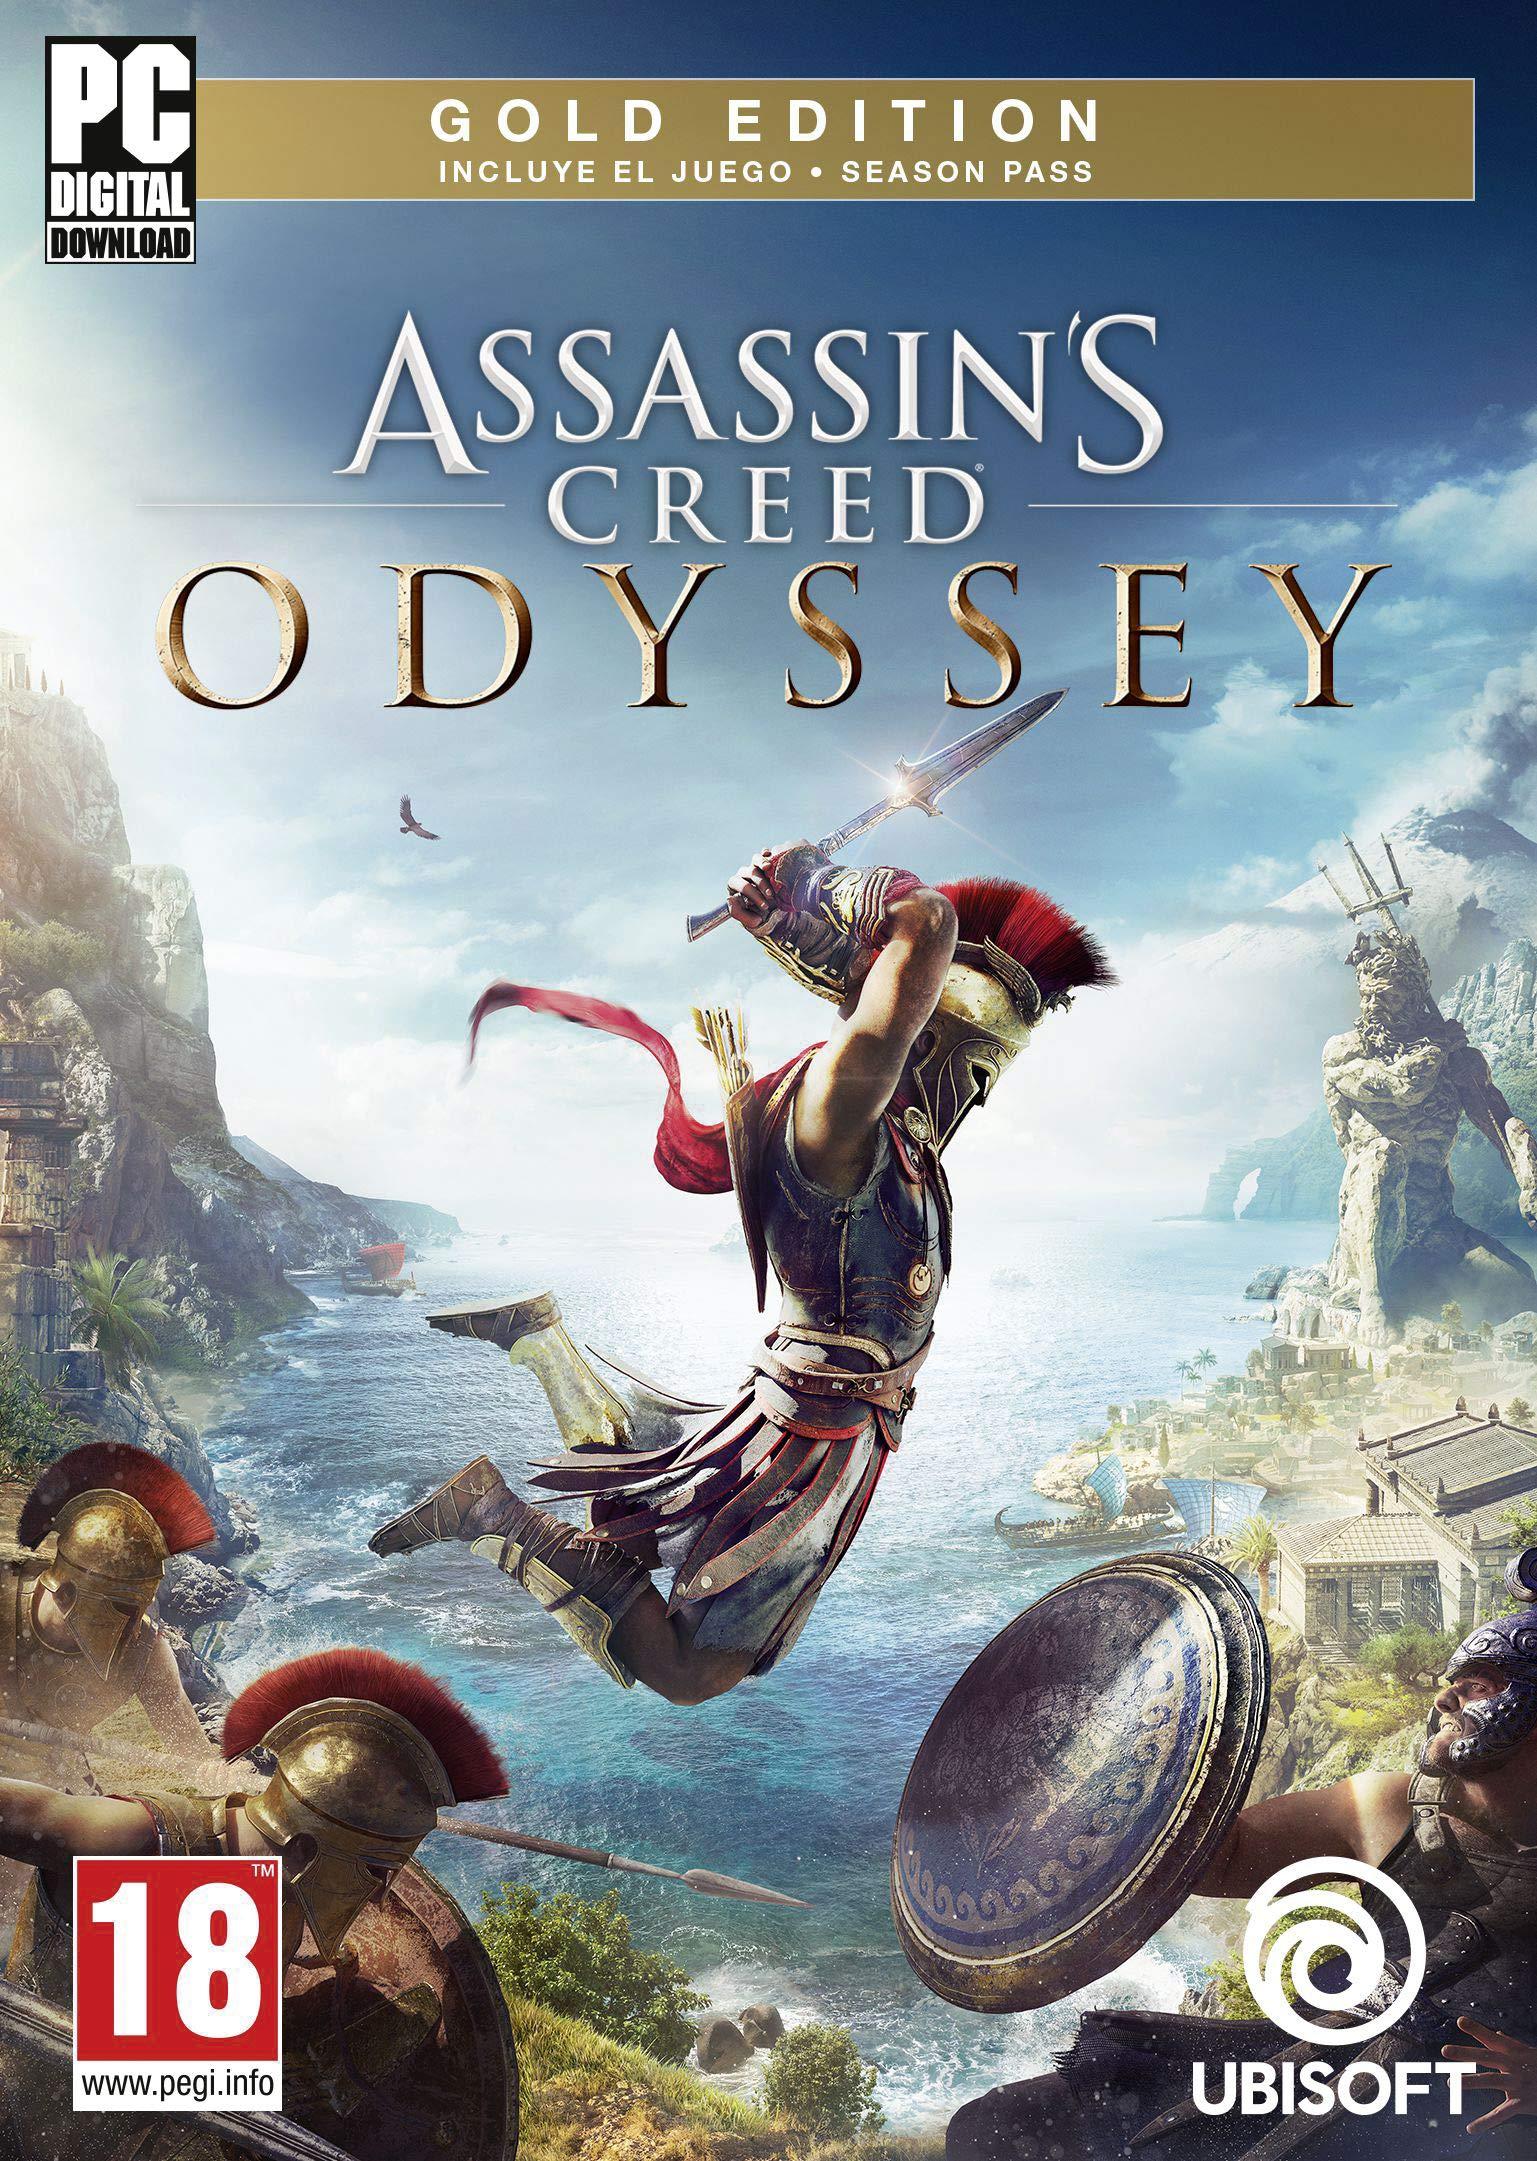 Assassins Creed Odyssey - Gold Edition | Código Uplay para PC: Amazon.es: Videojuegos